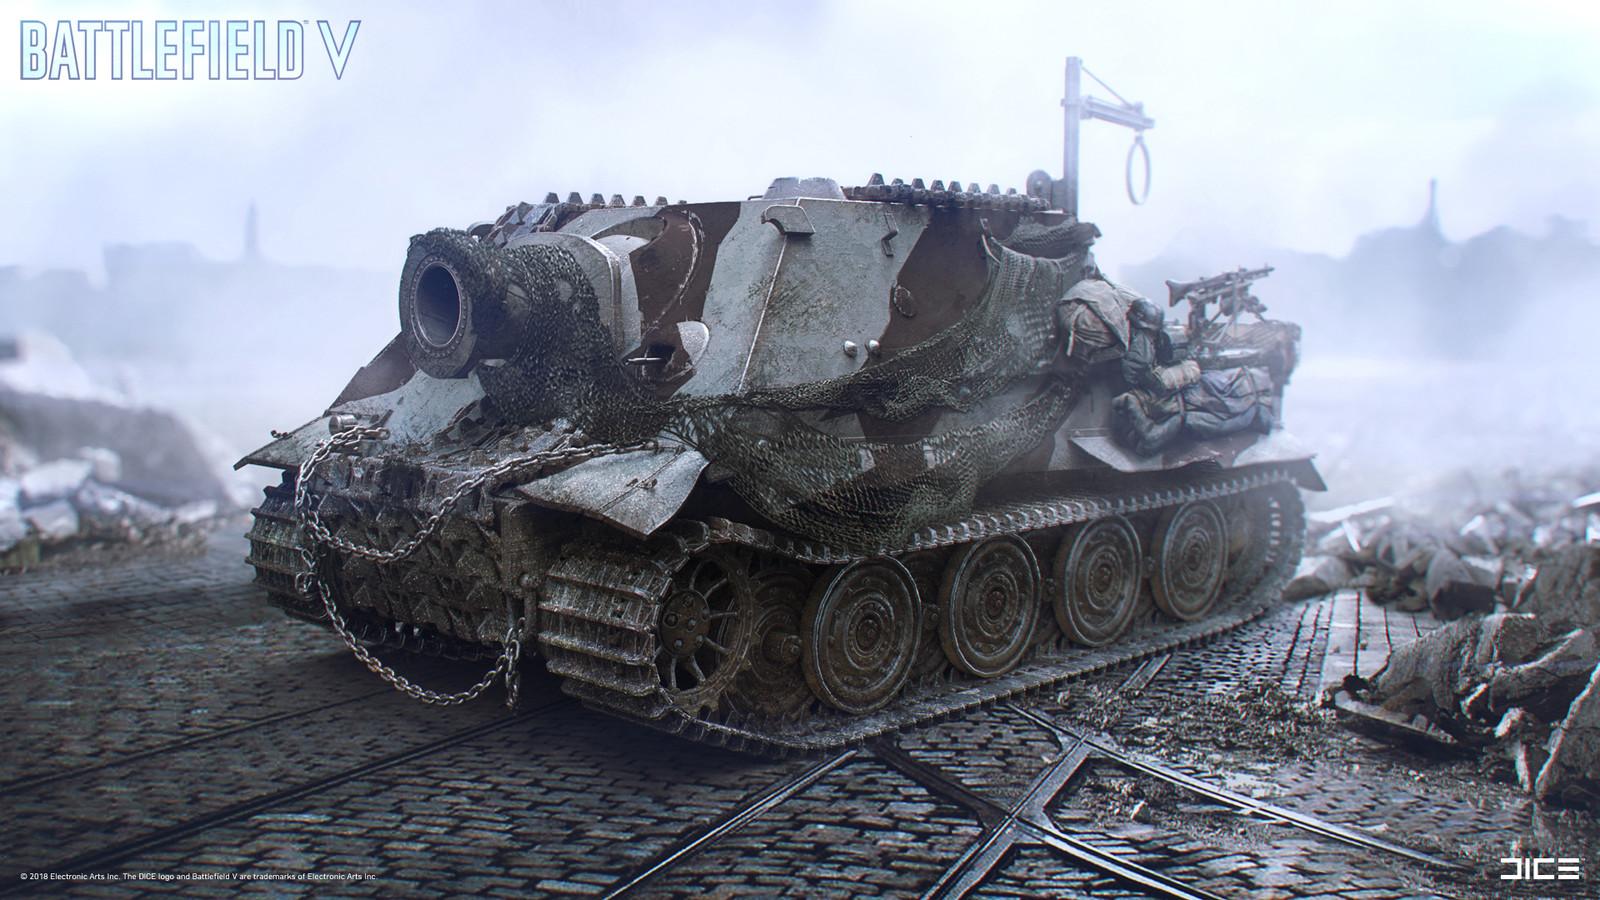 """Battlefield V"" - Sturmtiger - Vehicle concept art. Collaboration with Johannes Palmblad."